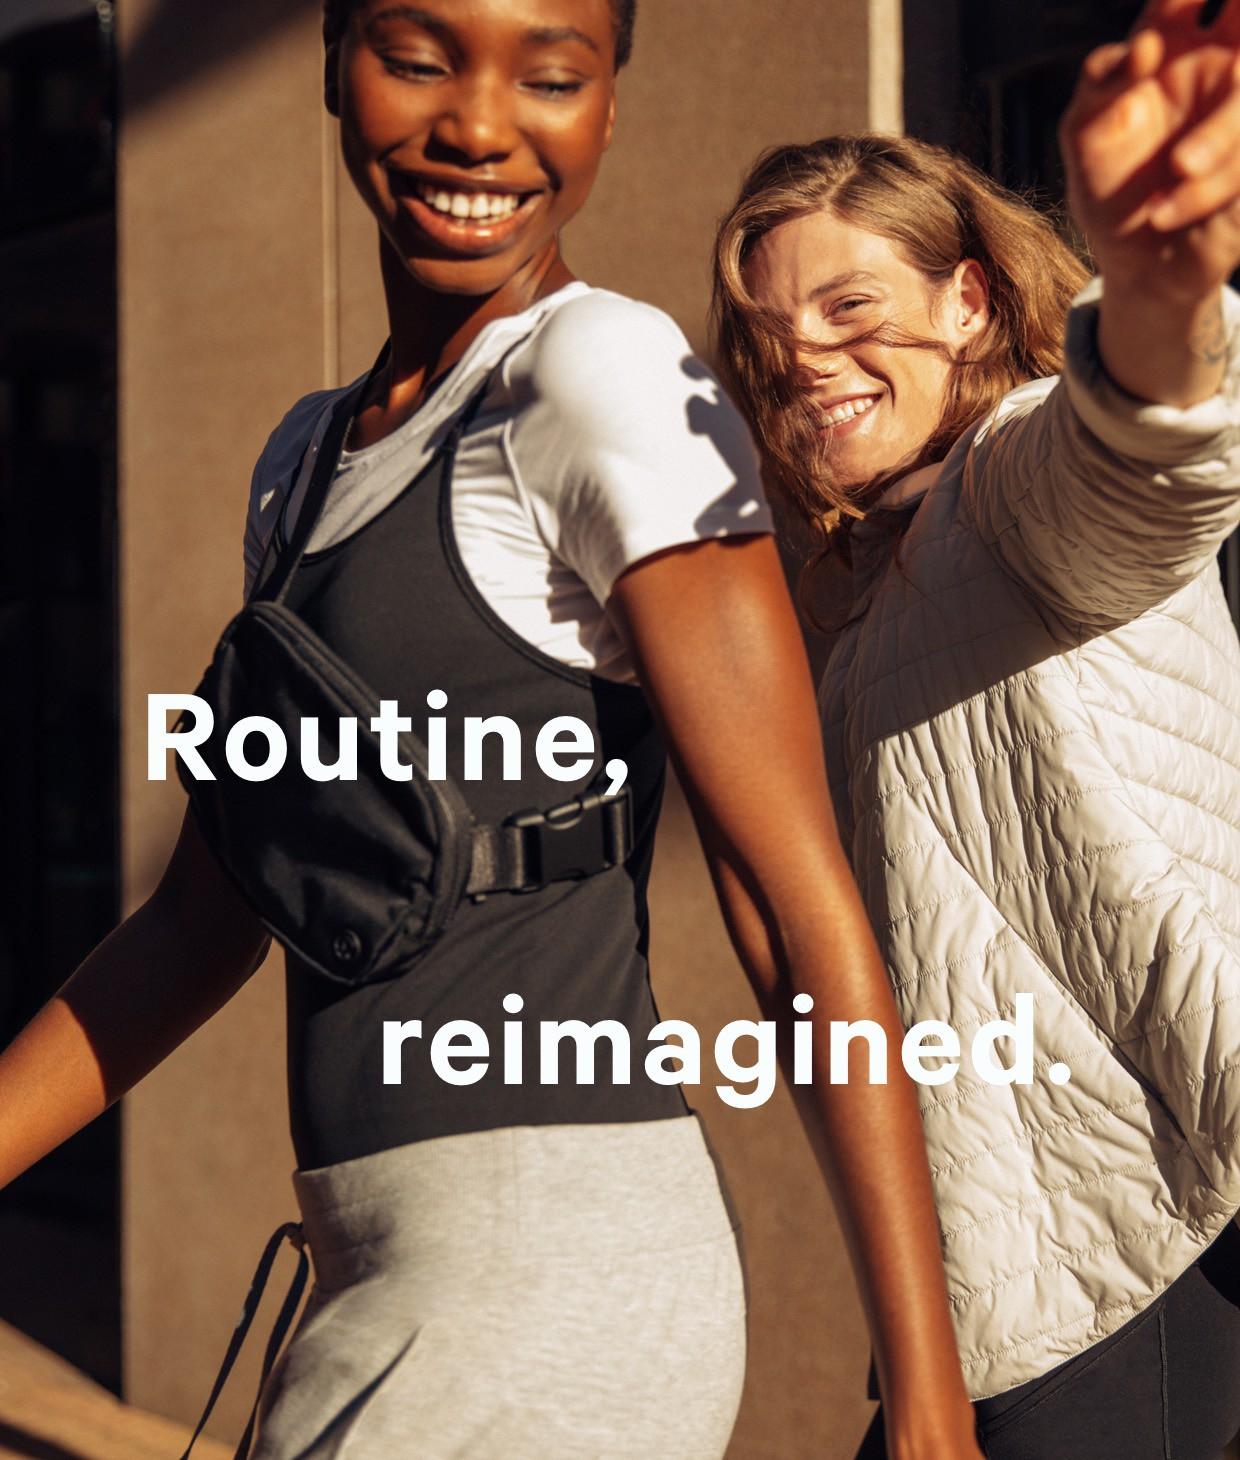 ROUTINE, REIMAGINED.